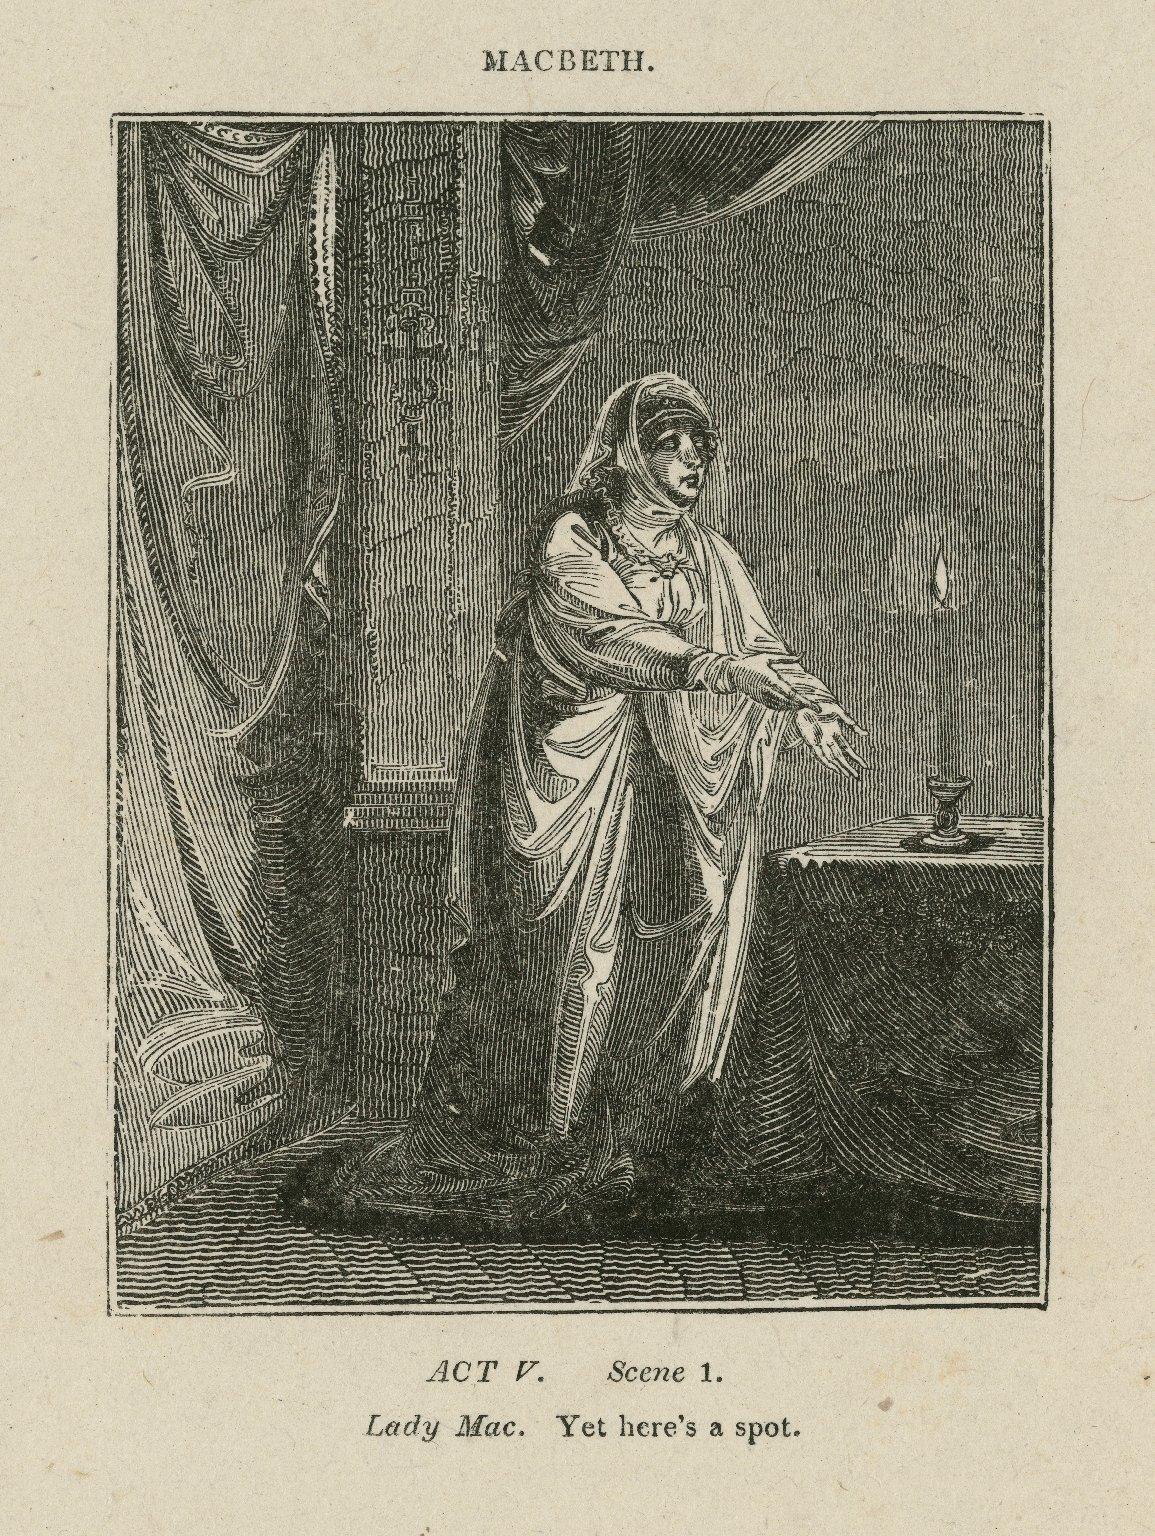 Macbeth, act V, scene 1, Lady Mac.: Yet yere's a spot [graphic] / [John Thurston] ; engraved by Allen Robert Branston.